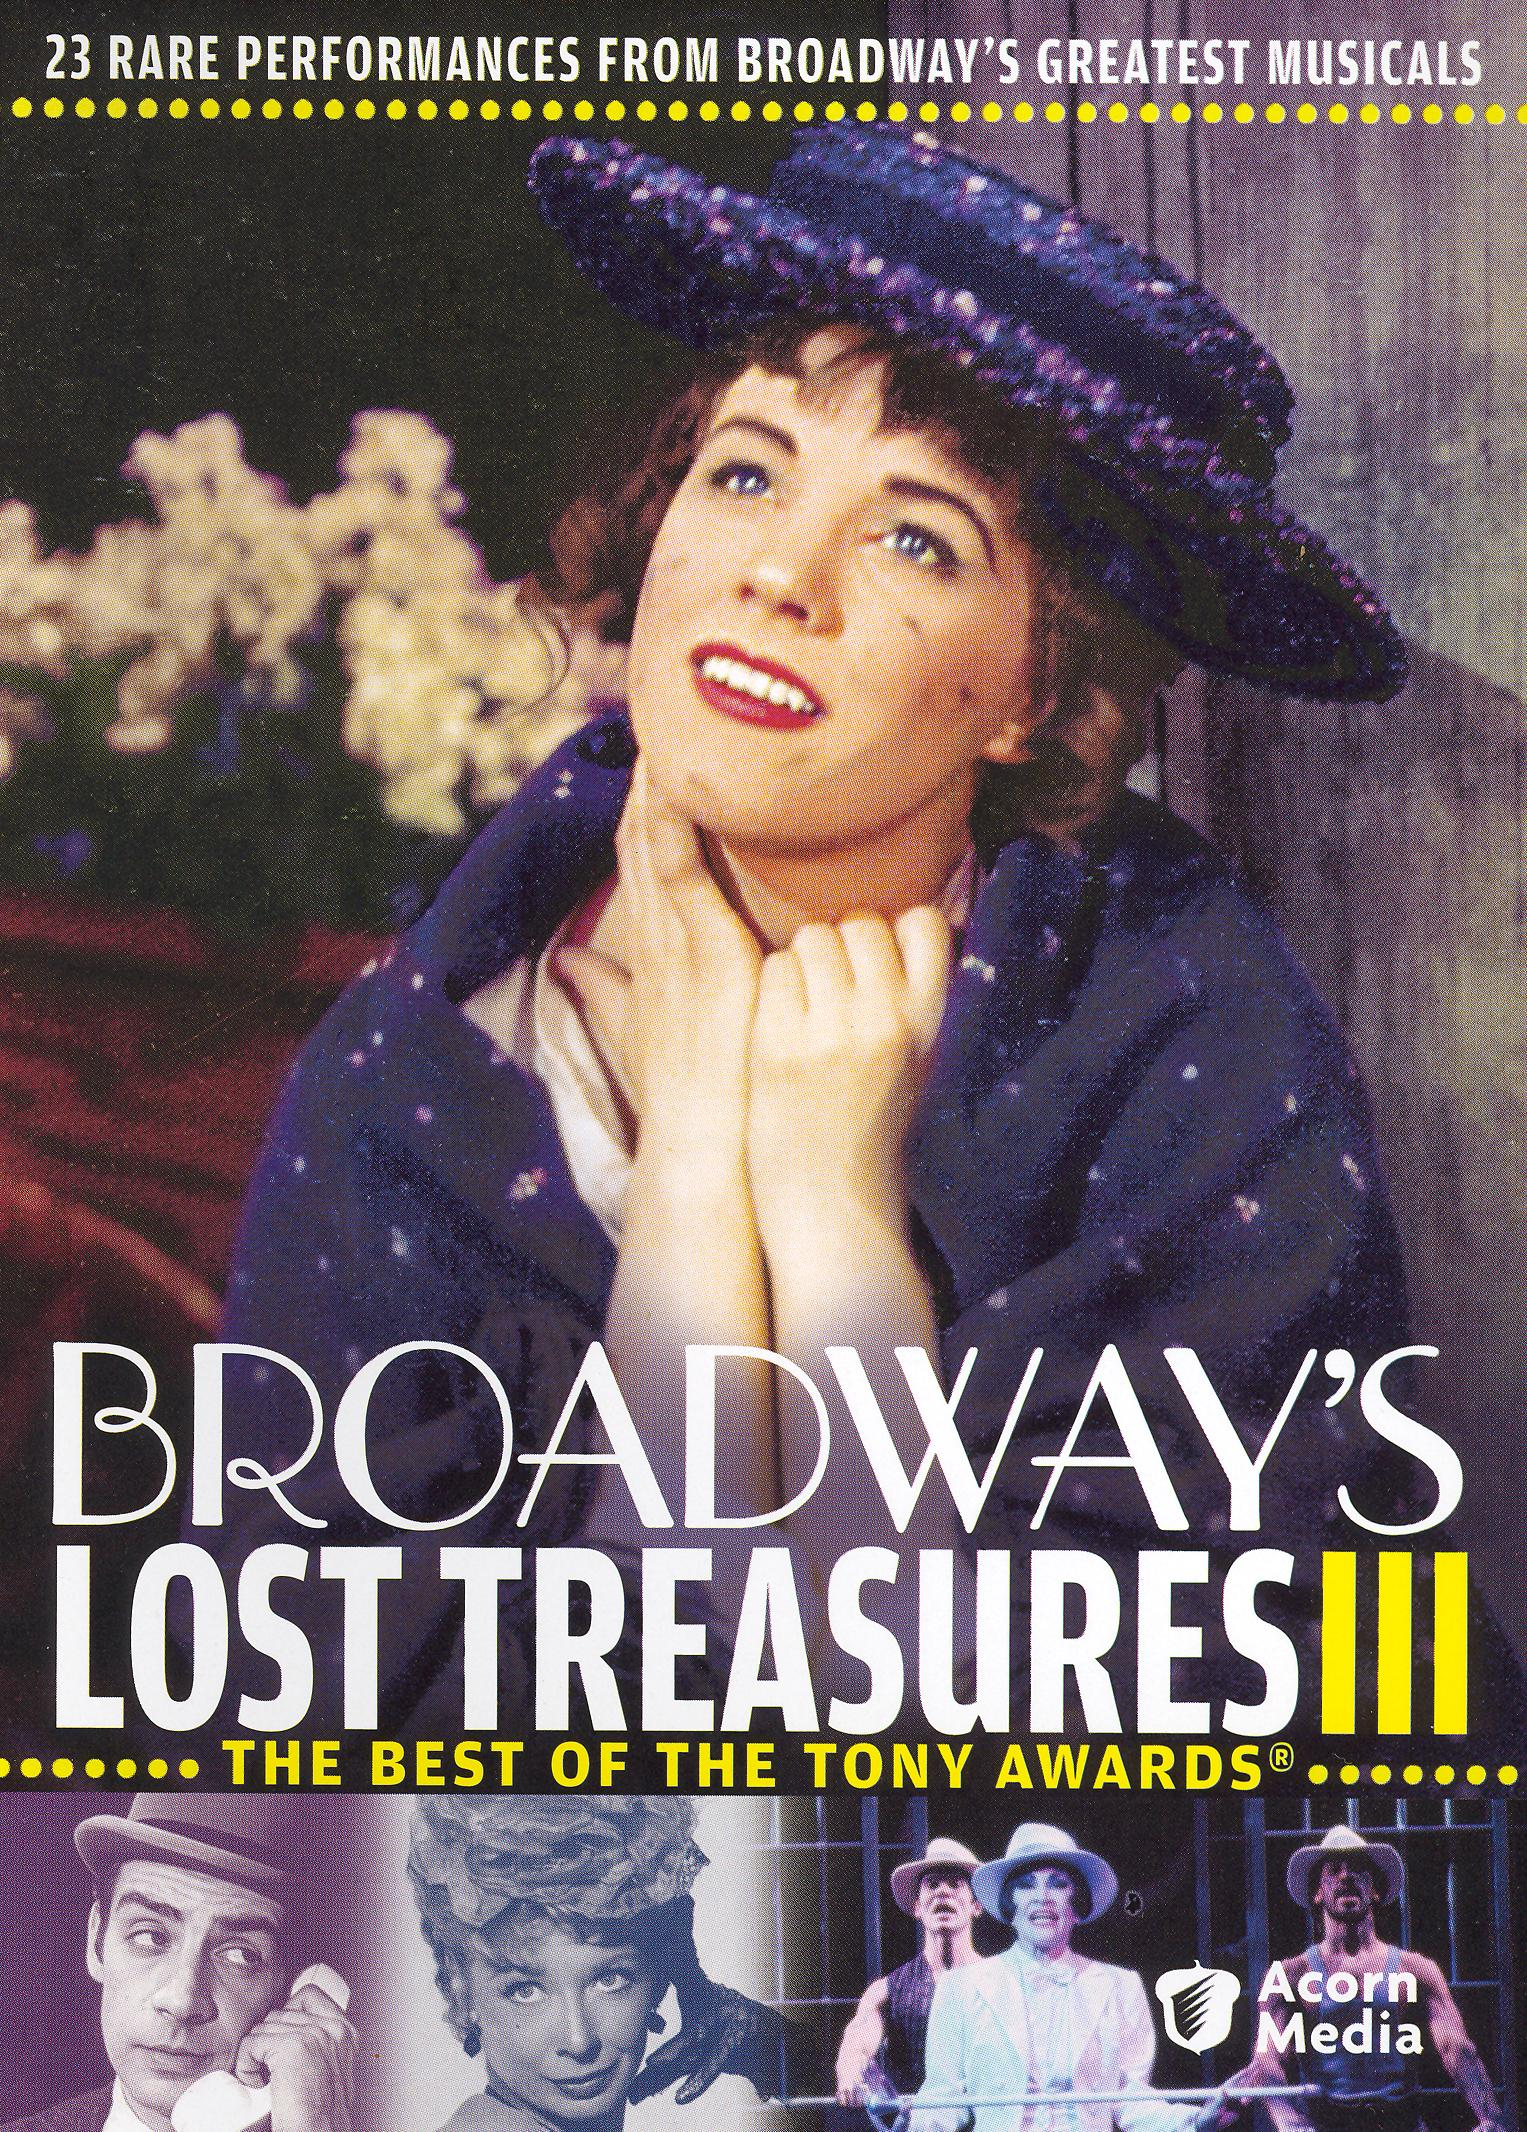 Broadway's Lost Treasures, Vol. 3